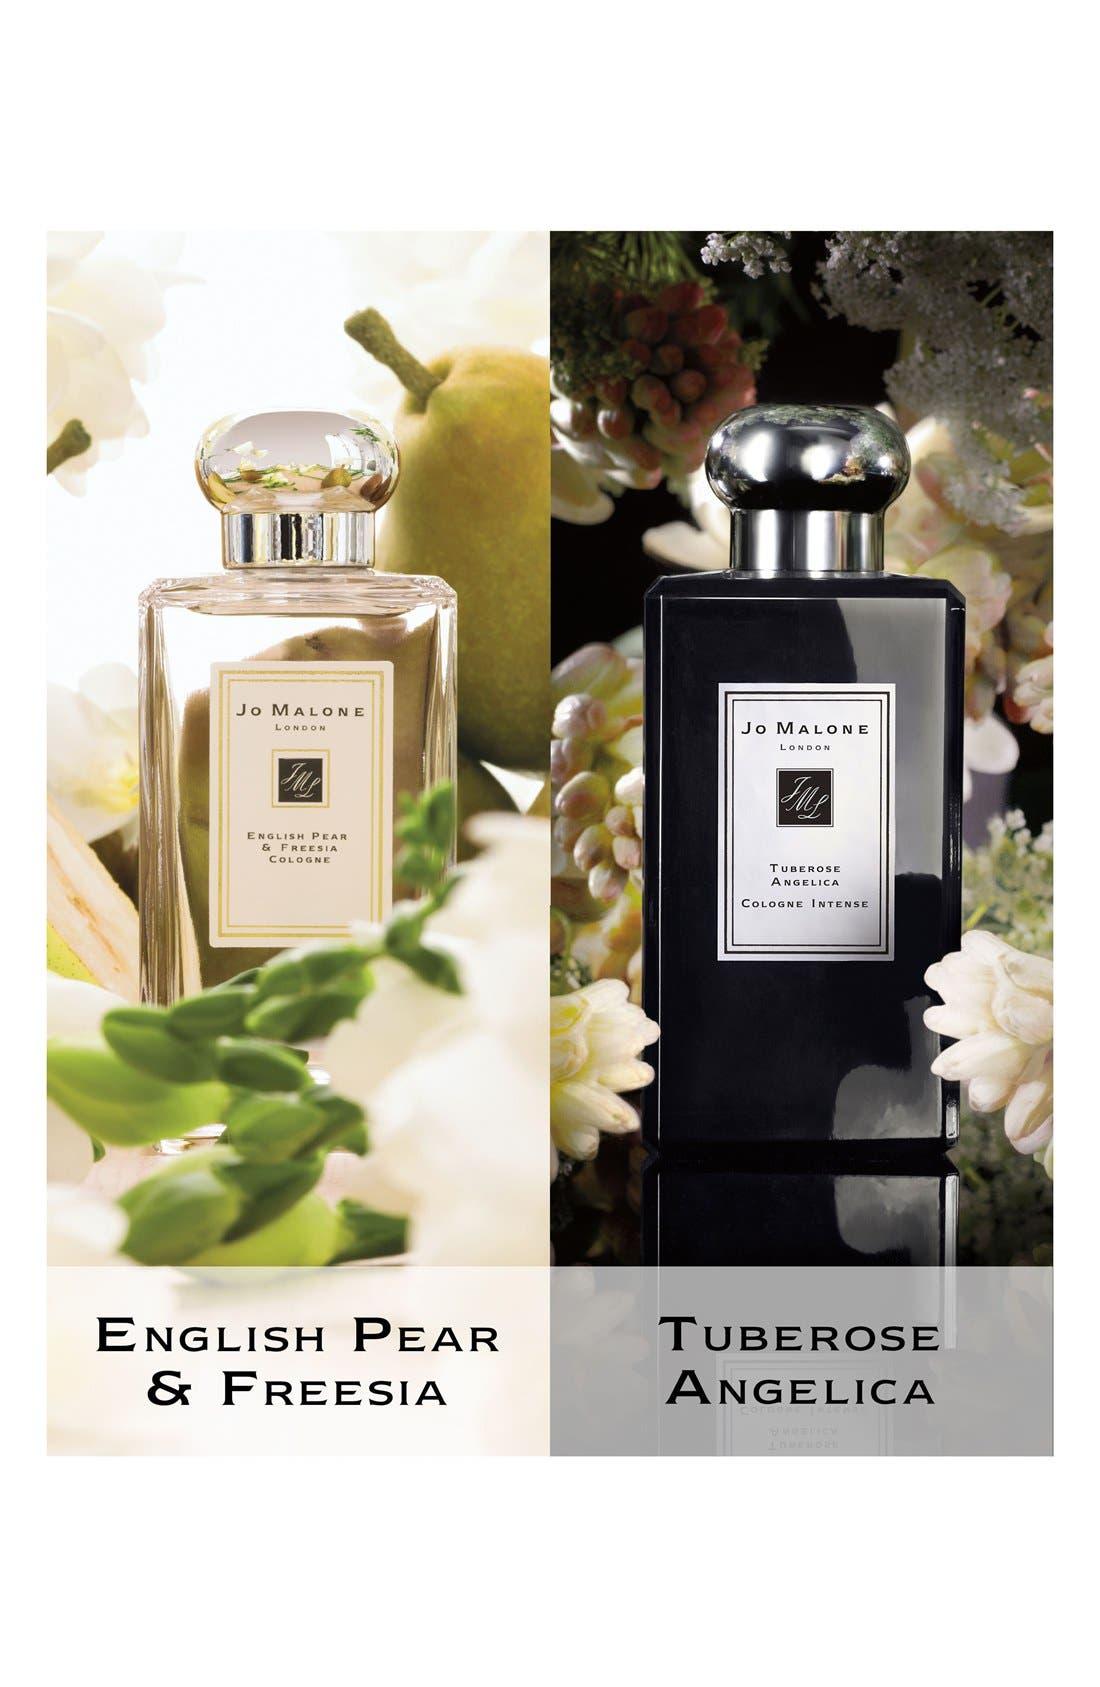 Jo Malone London™ English Pear & Freesia & Tuberose Angelica